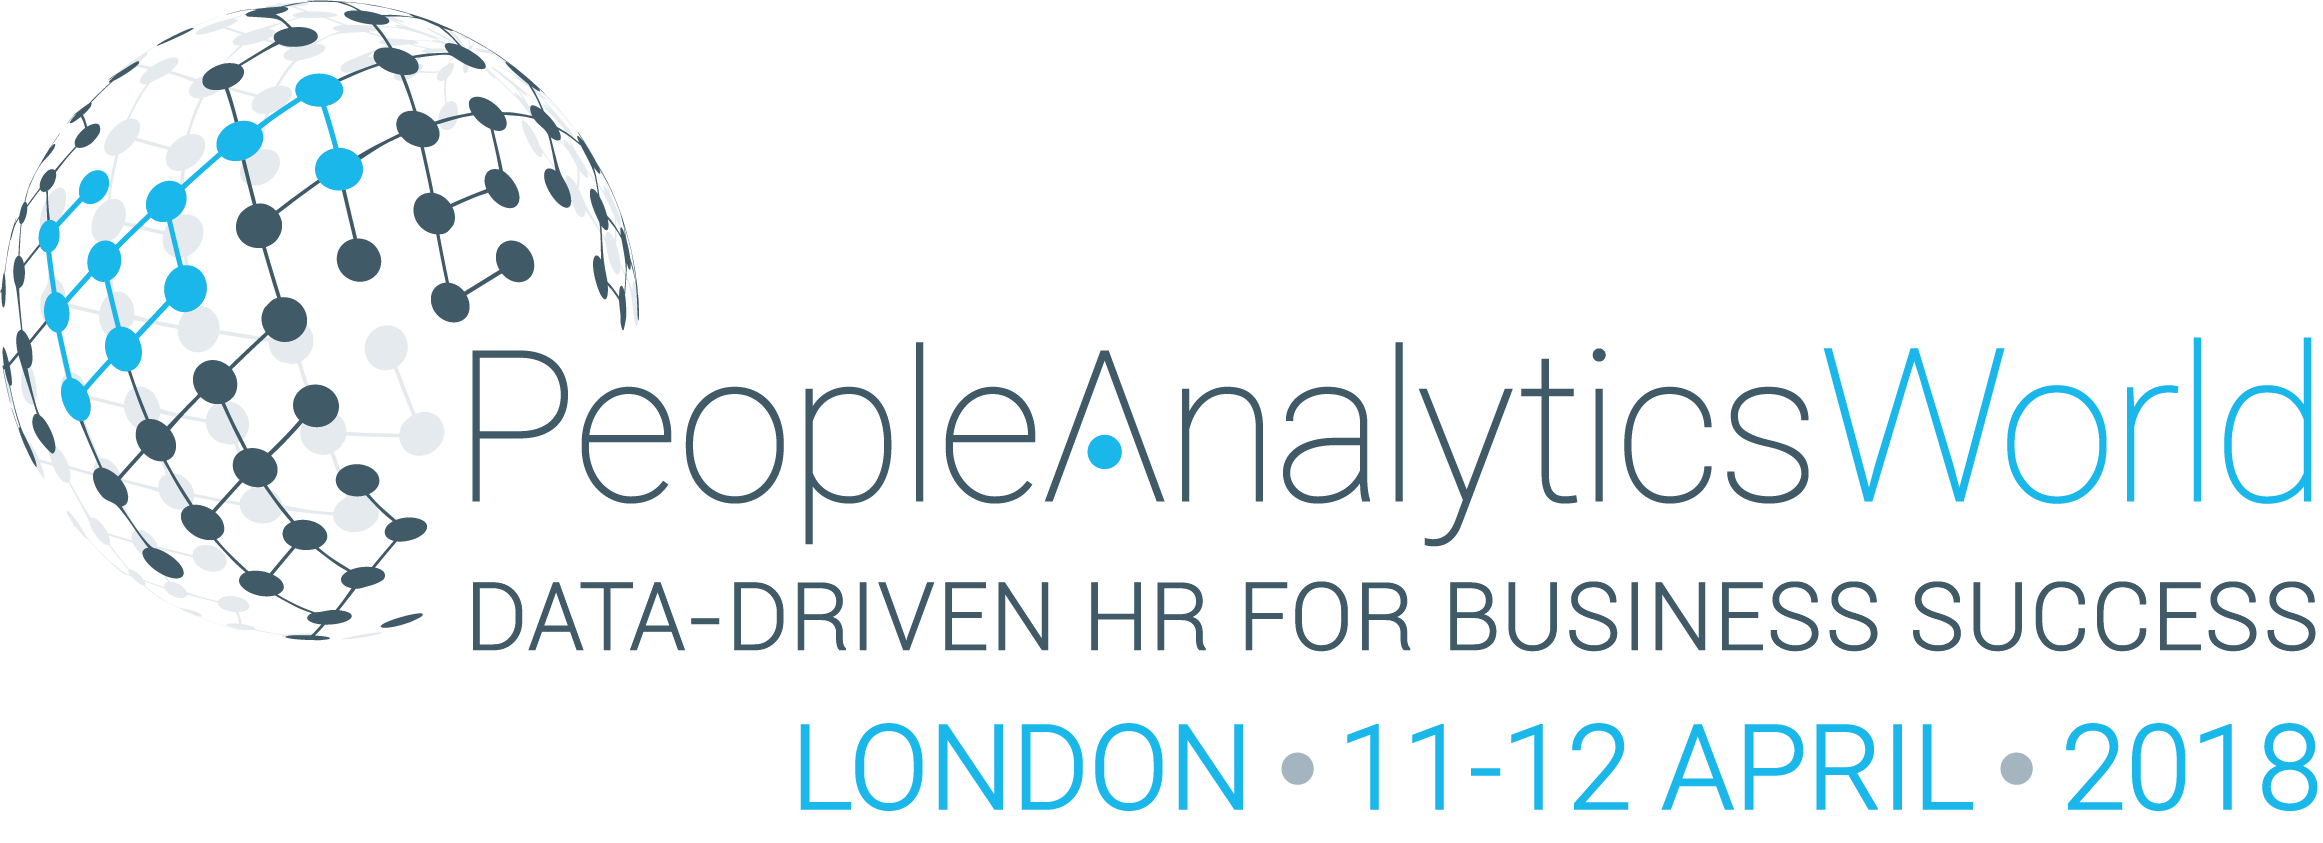 people analytics worl 2018 london